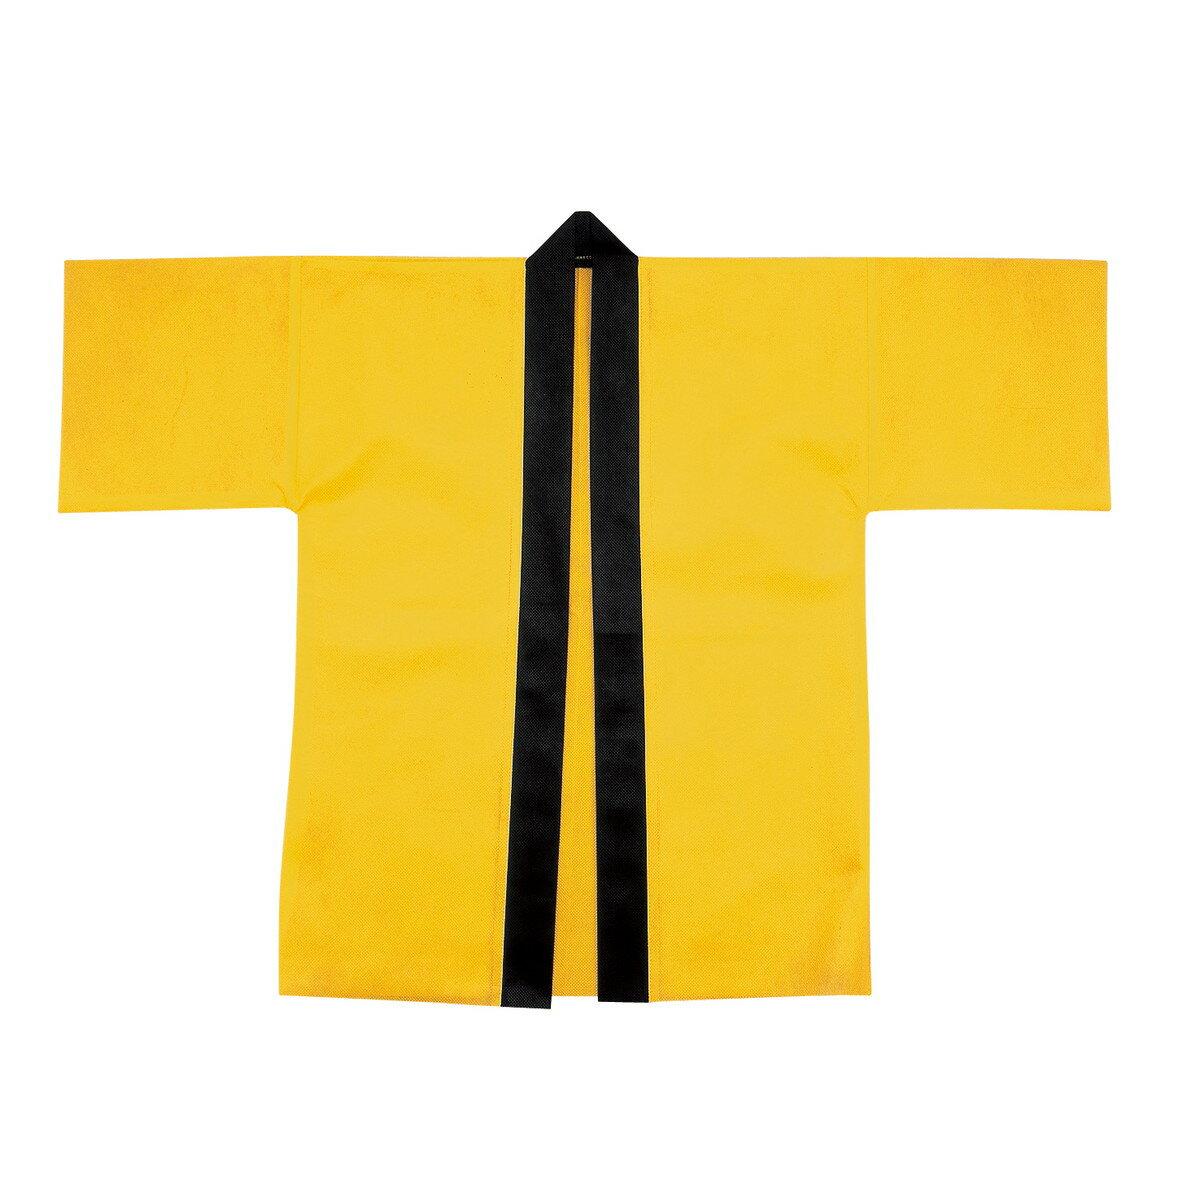 Artec(アーテック) カラー不織布ハッピ 園児用 C 黄 #4052